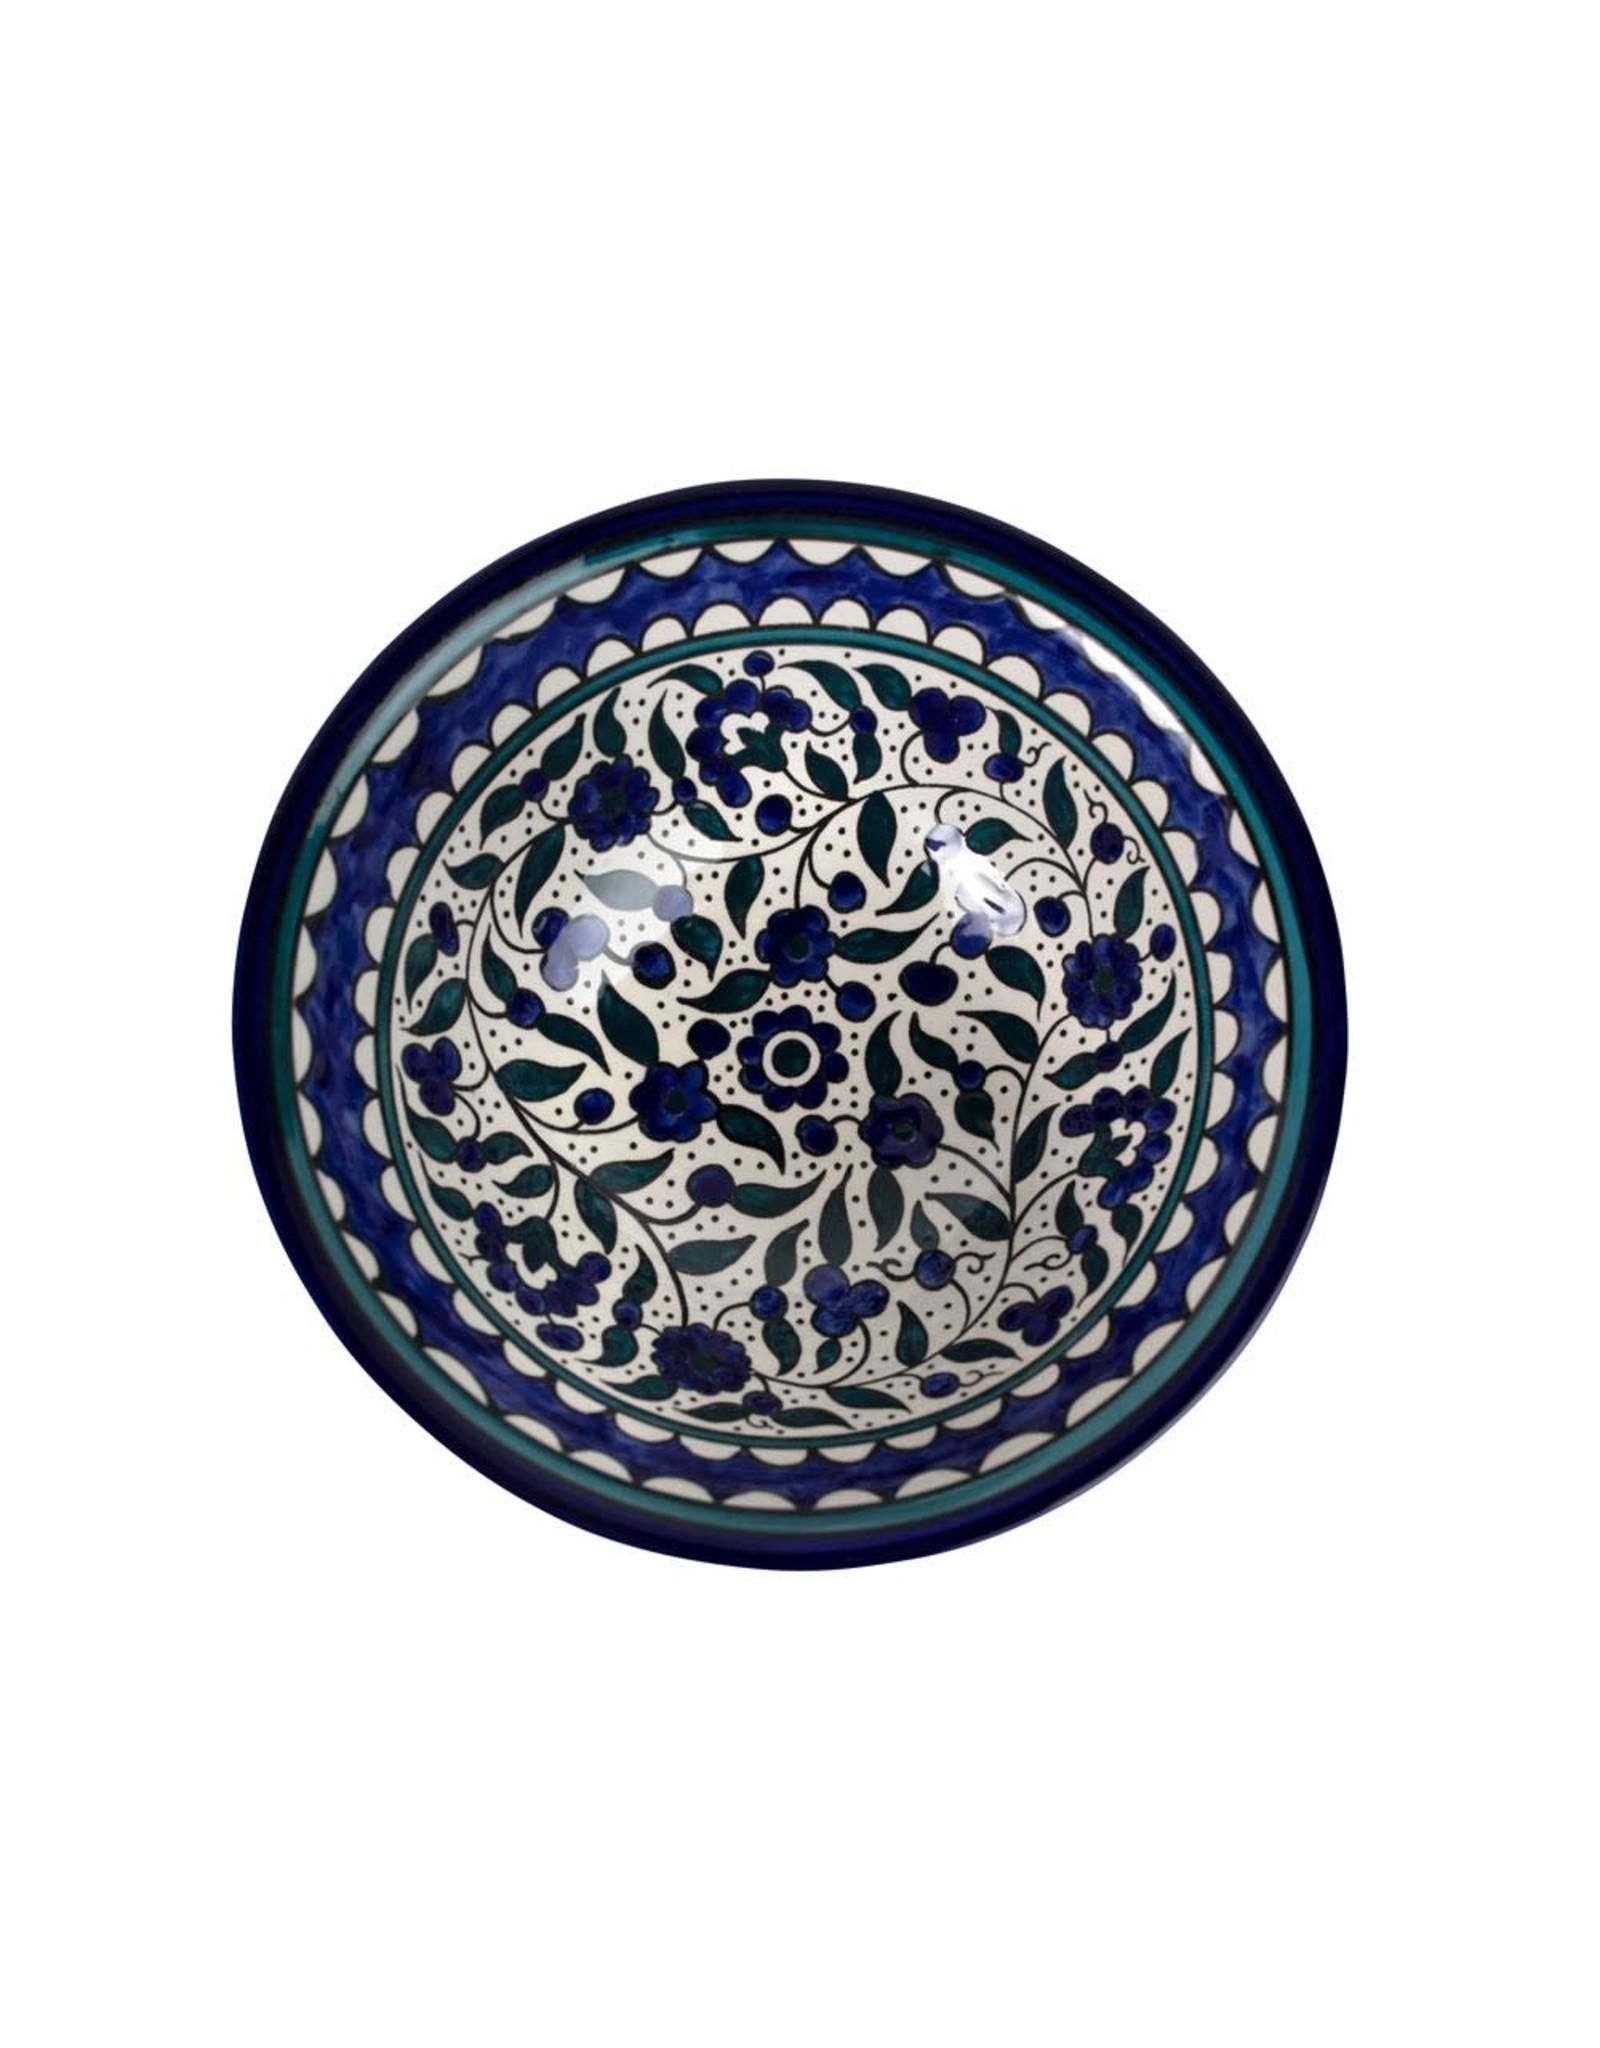 TTV USA Large Blue Floral Bowl, Palestine